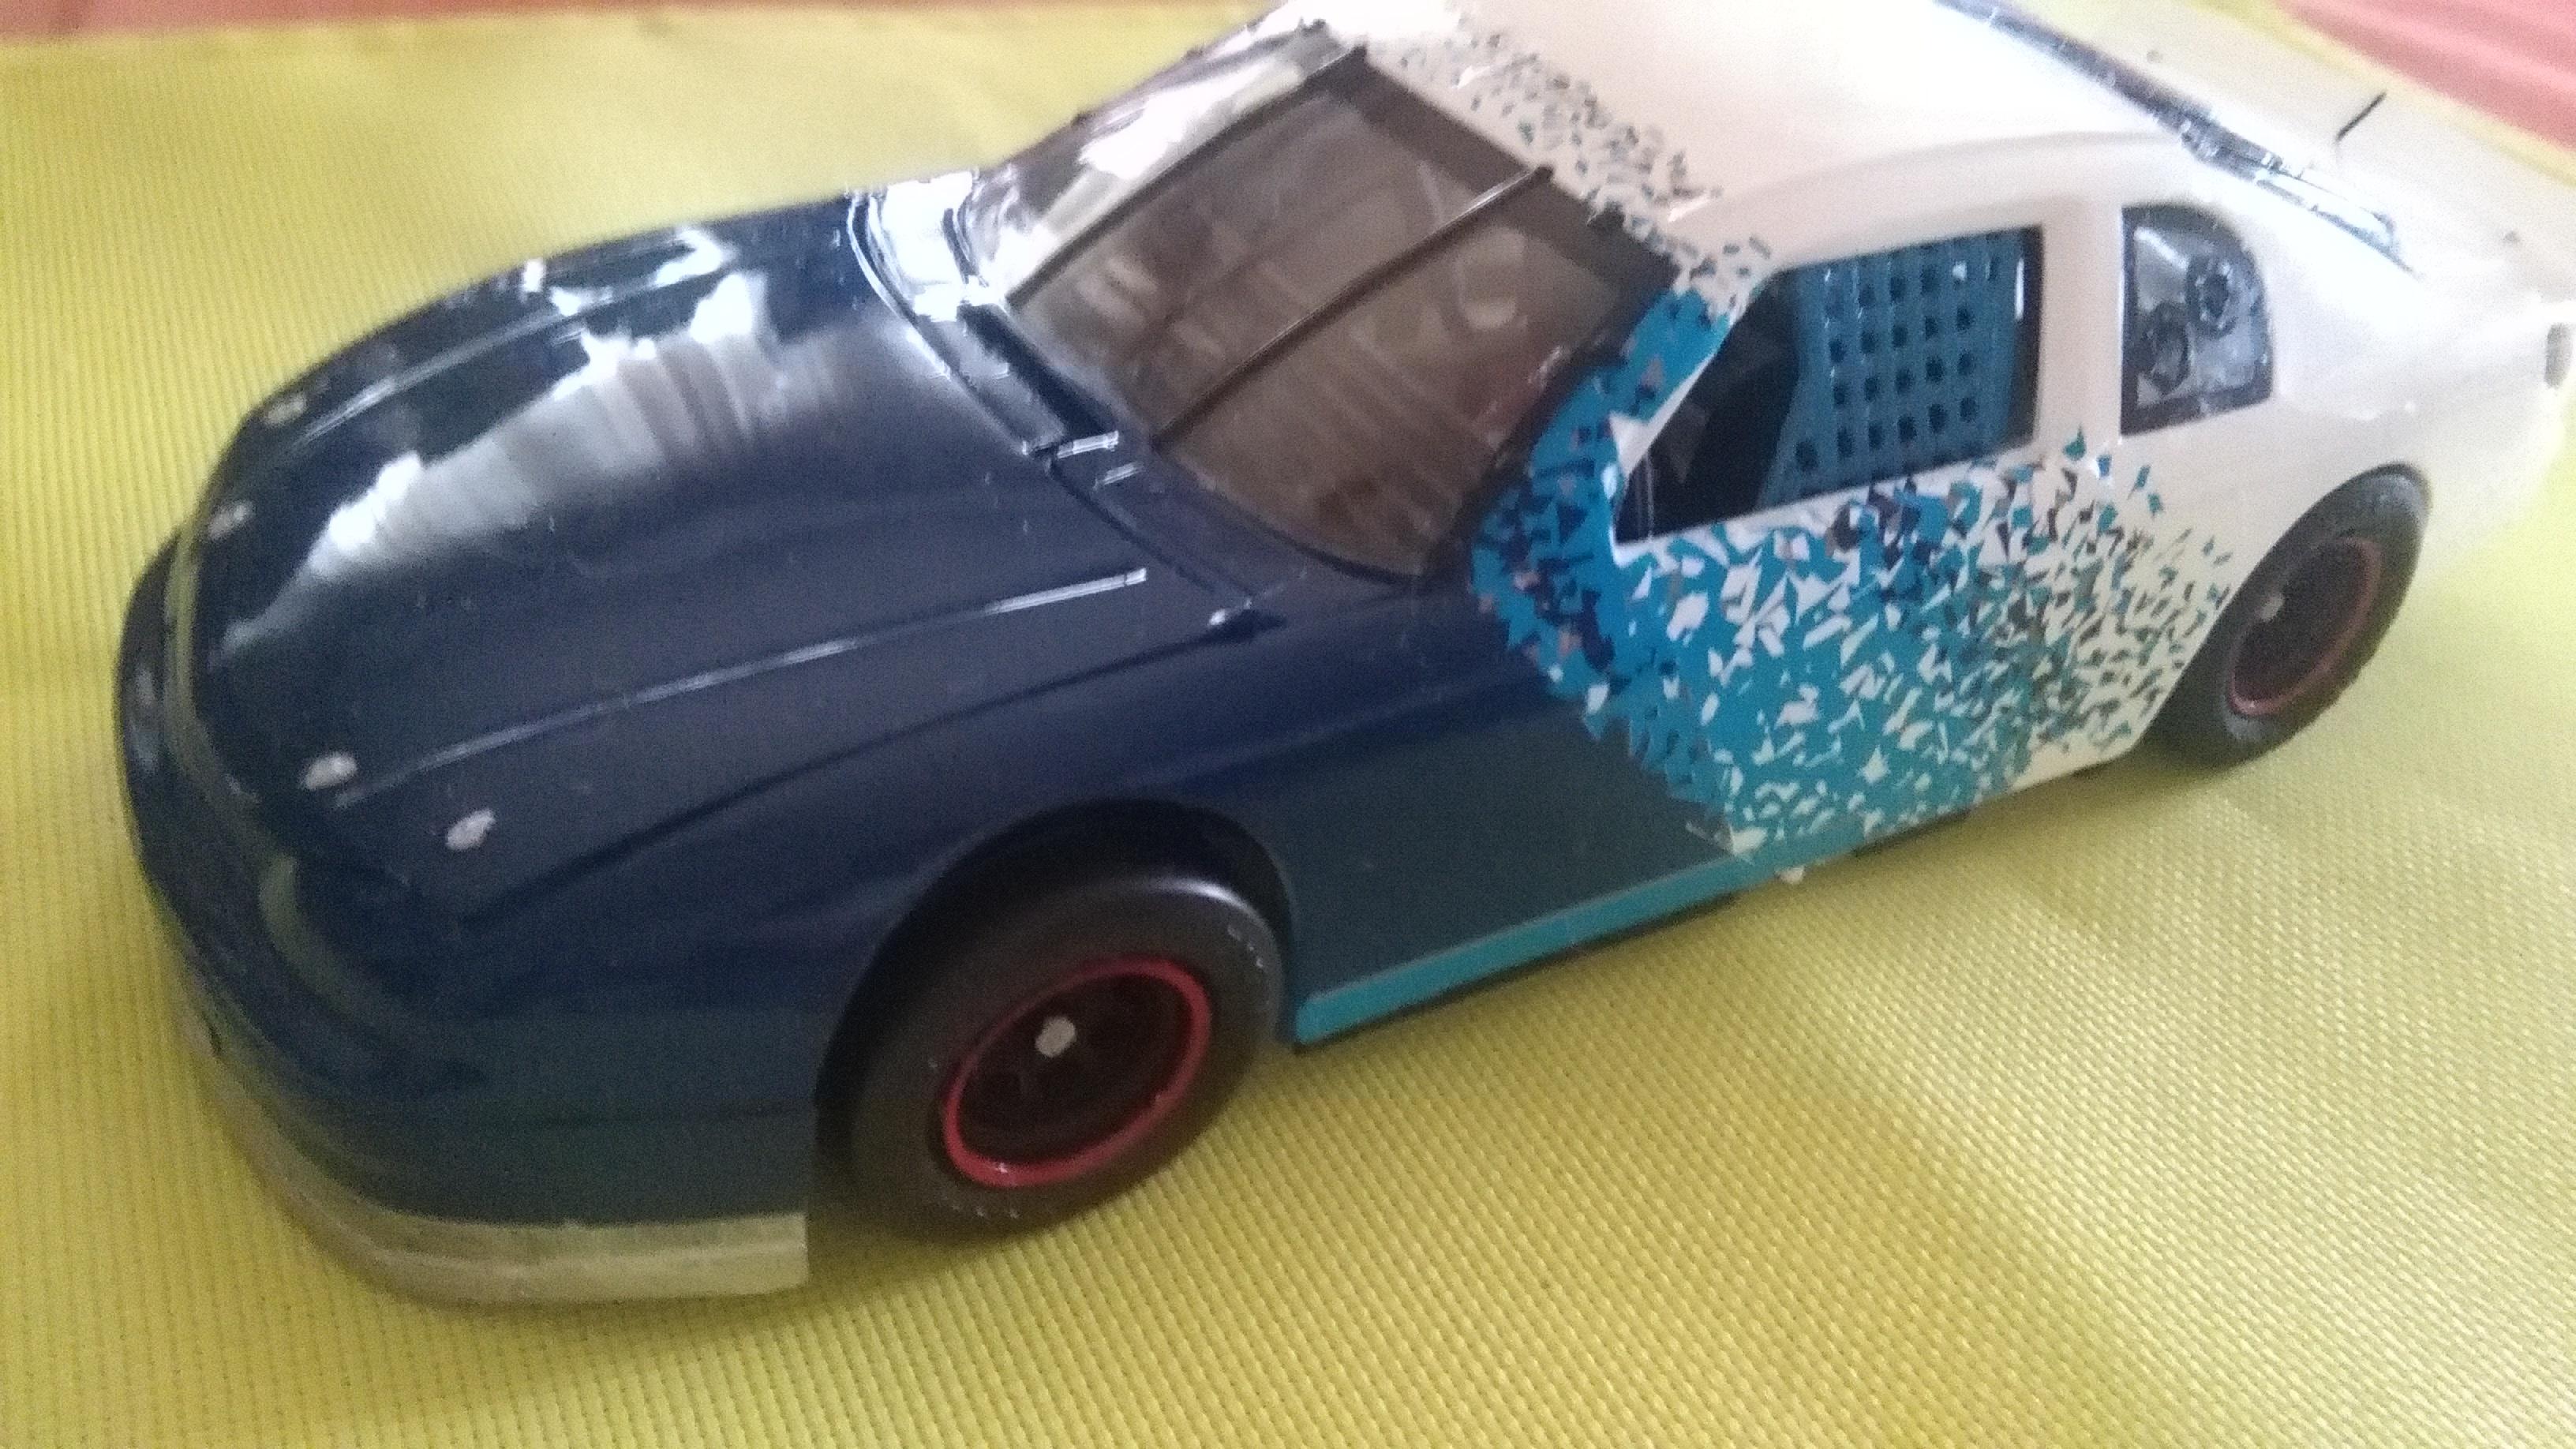 Chevy Monte-Carlo 1998 #32 Jeff Green Kleenex-Cottonelle   600837IMG20160124131150